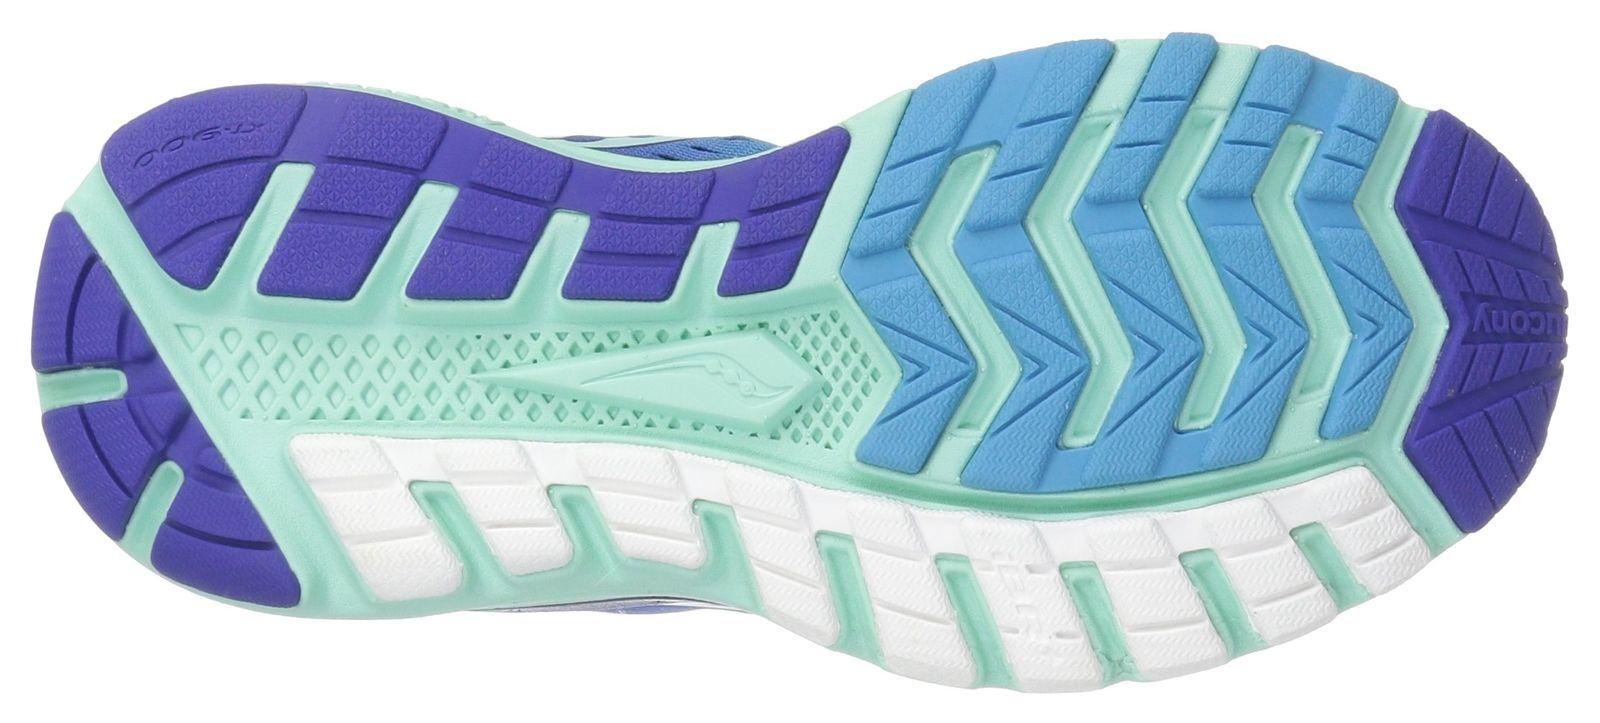 Saucony Women's Breakthru 3 Running Shoe and 23 similar items